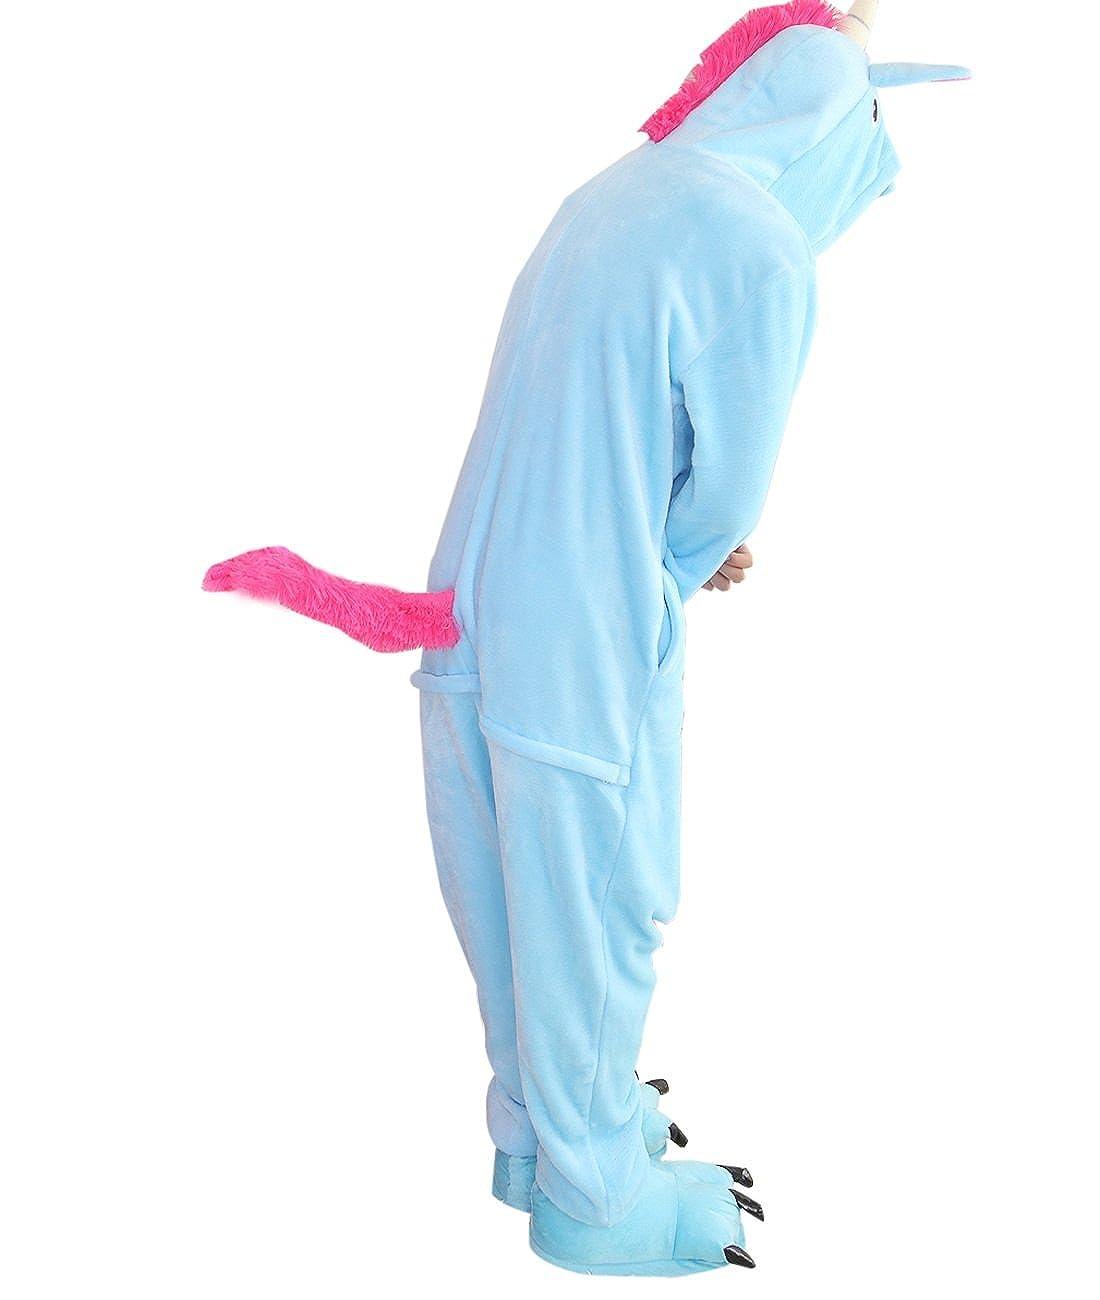 cefb53e35 Amazon.com  Onesies Costume for Couples Jumpsuit Home Pajama Robe ...